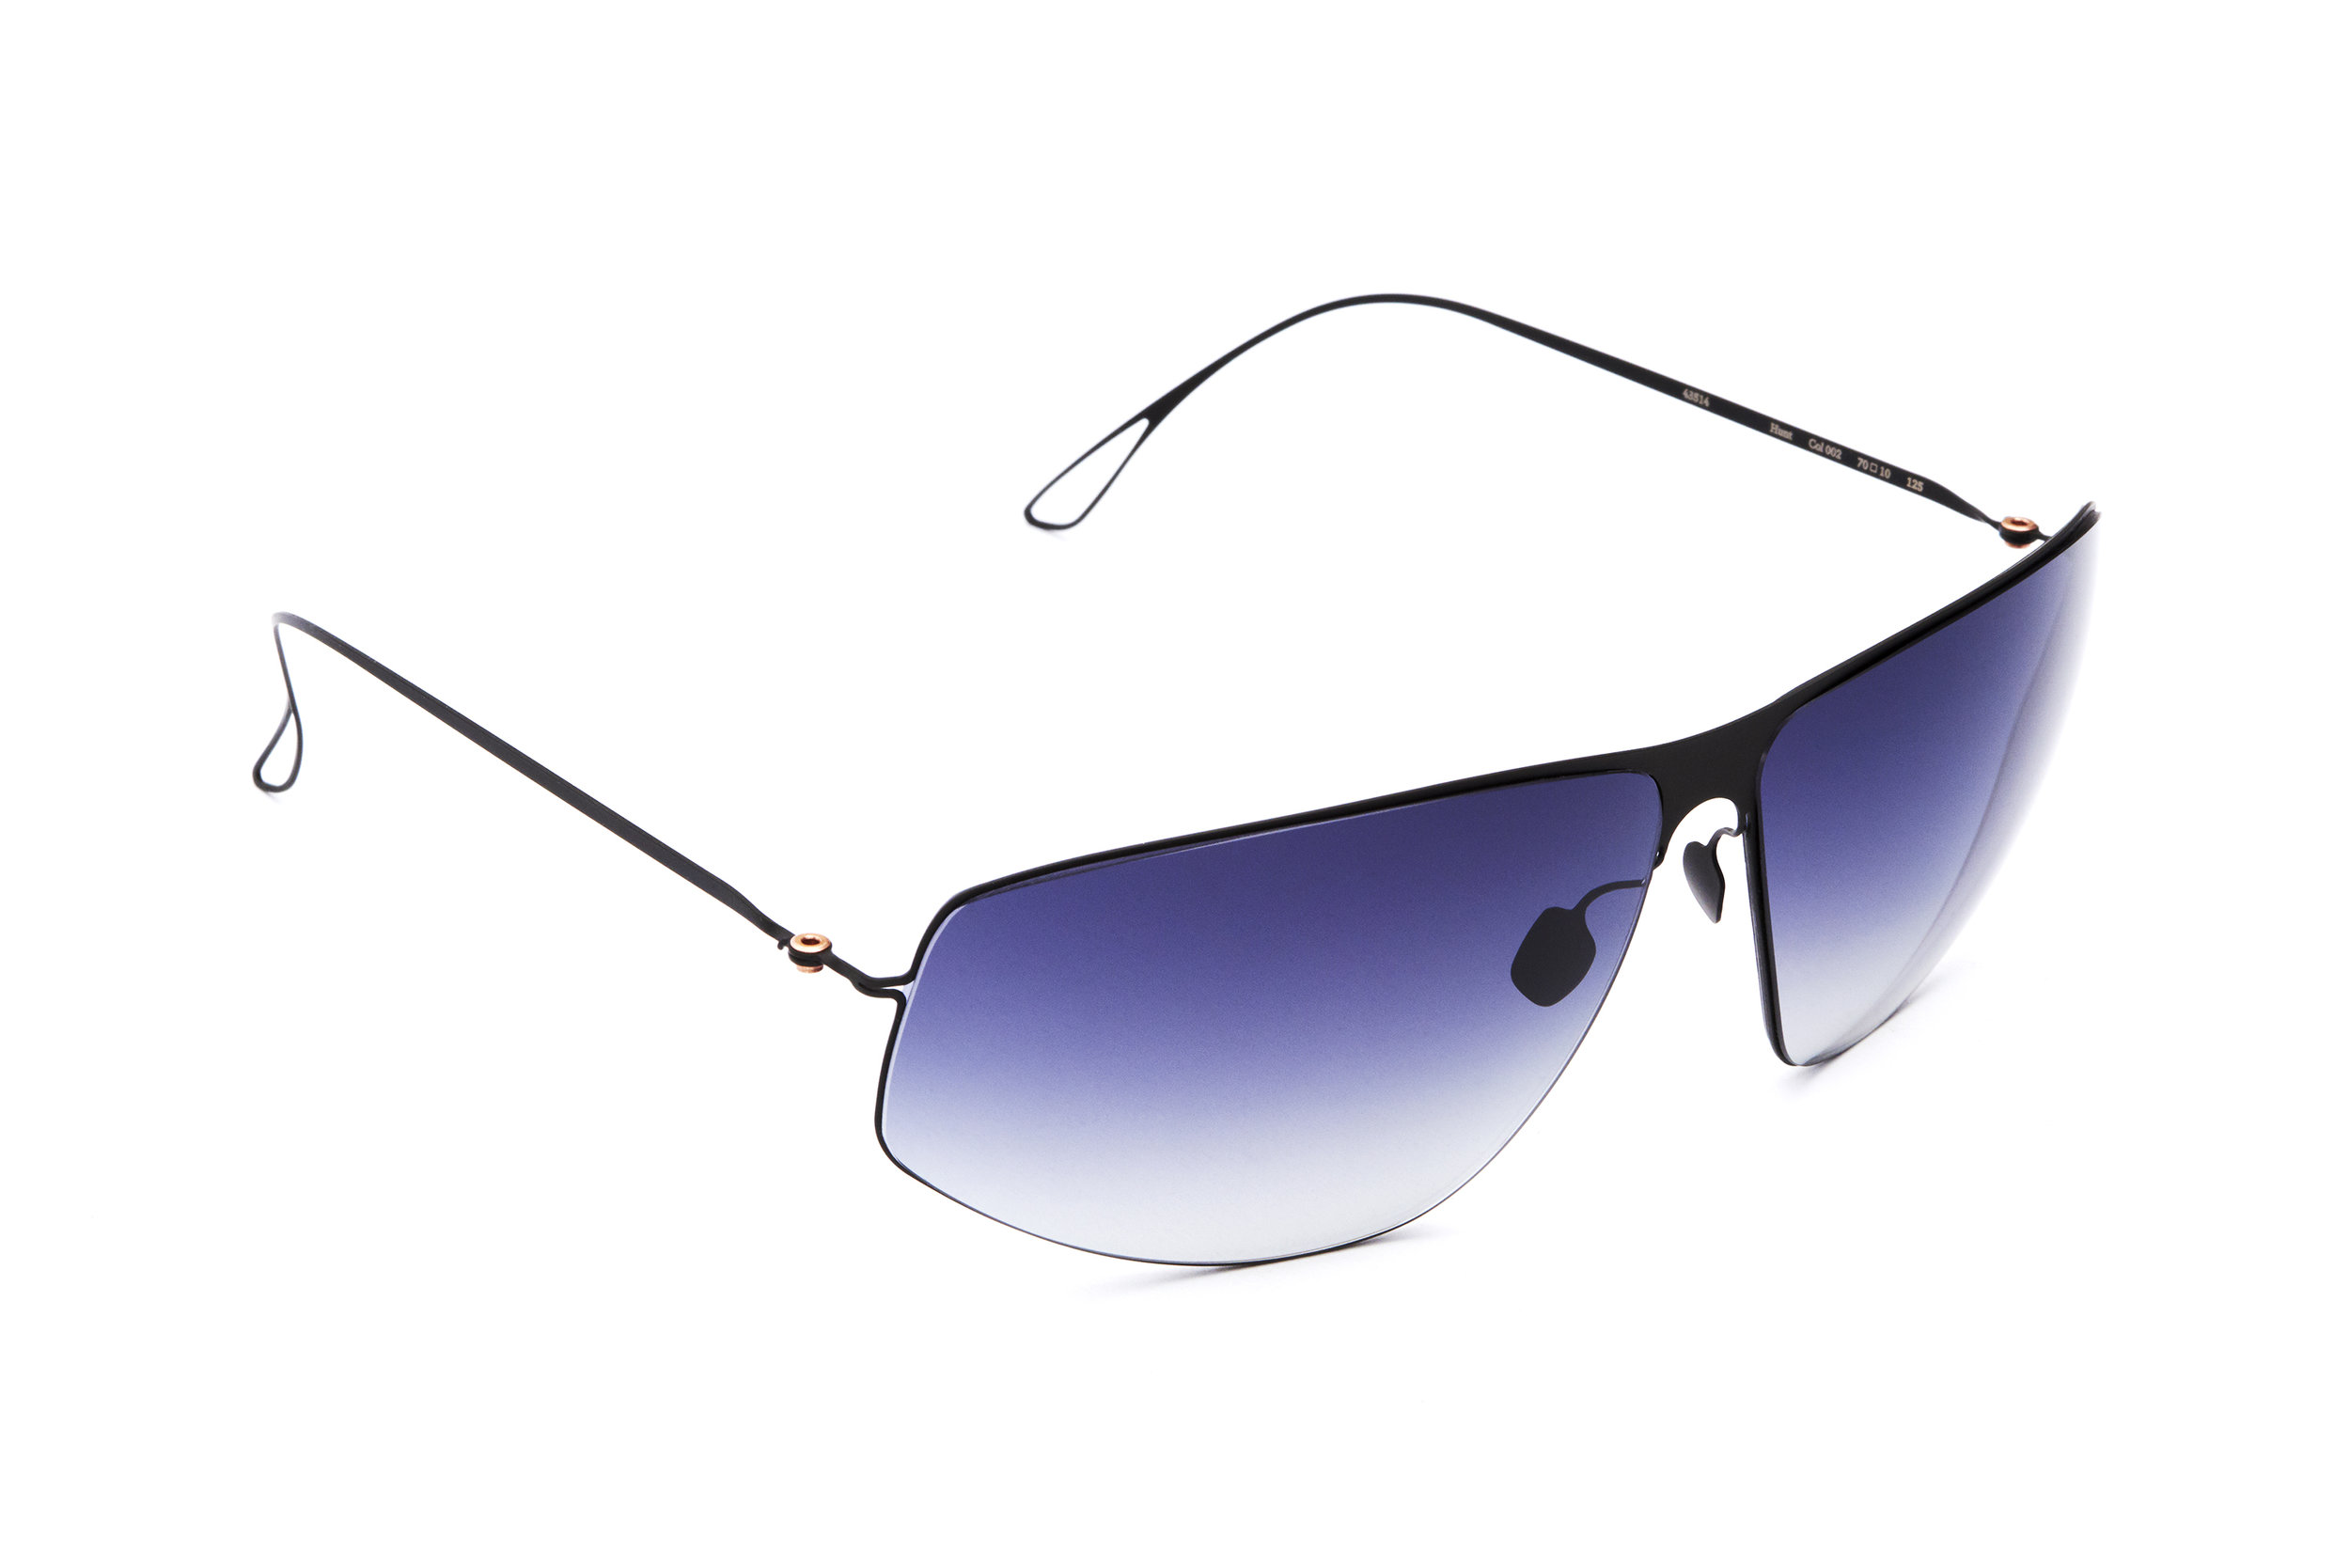 haffmans_neumeister_hunt_black_tempest_gradient_ultralight_sunglasses_angle_102479.jpg